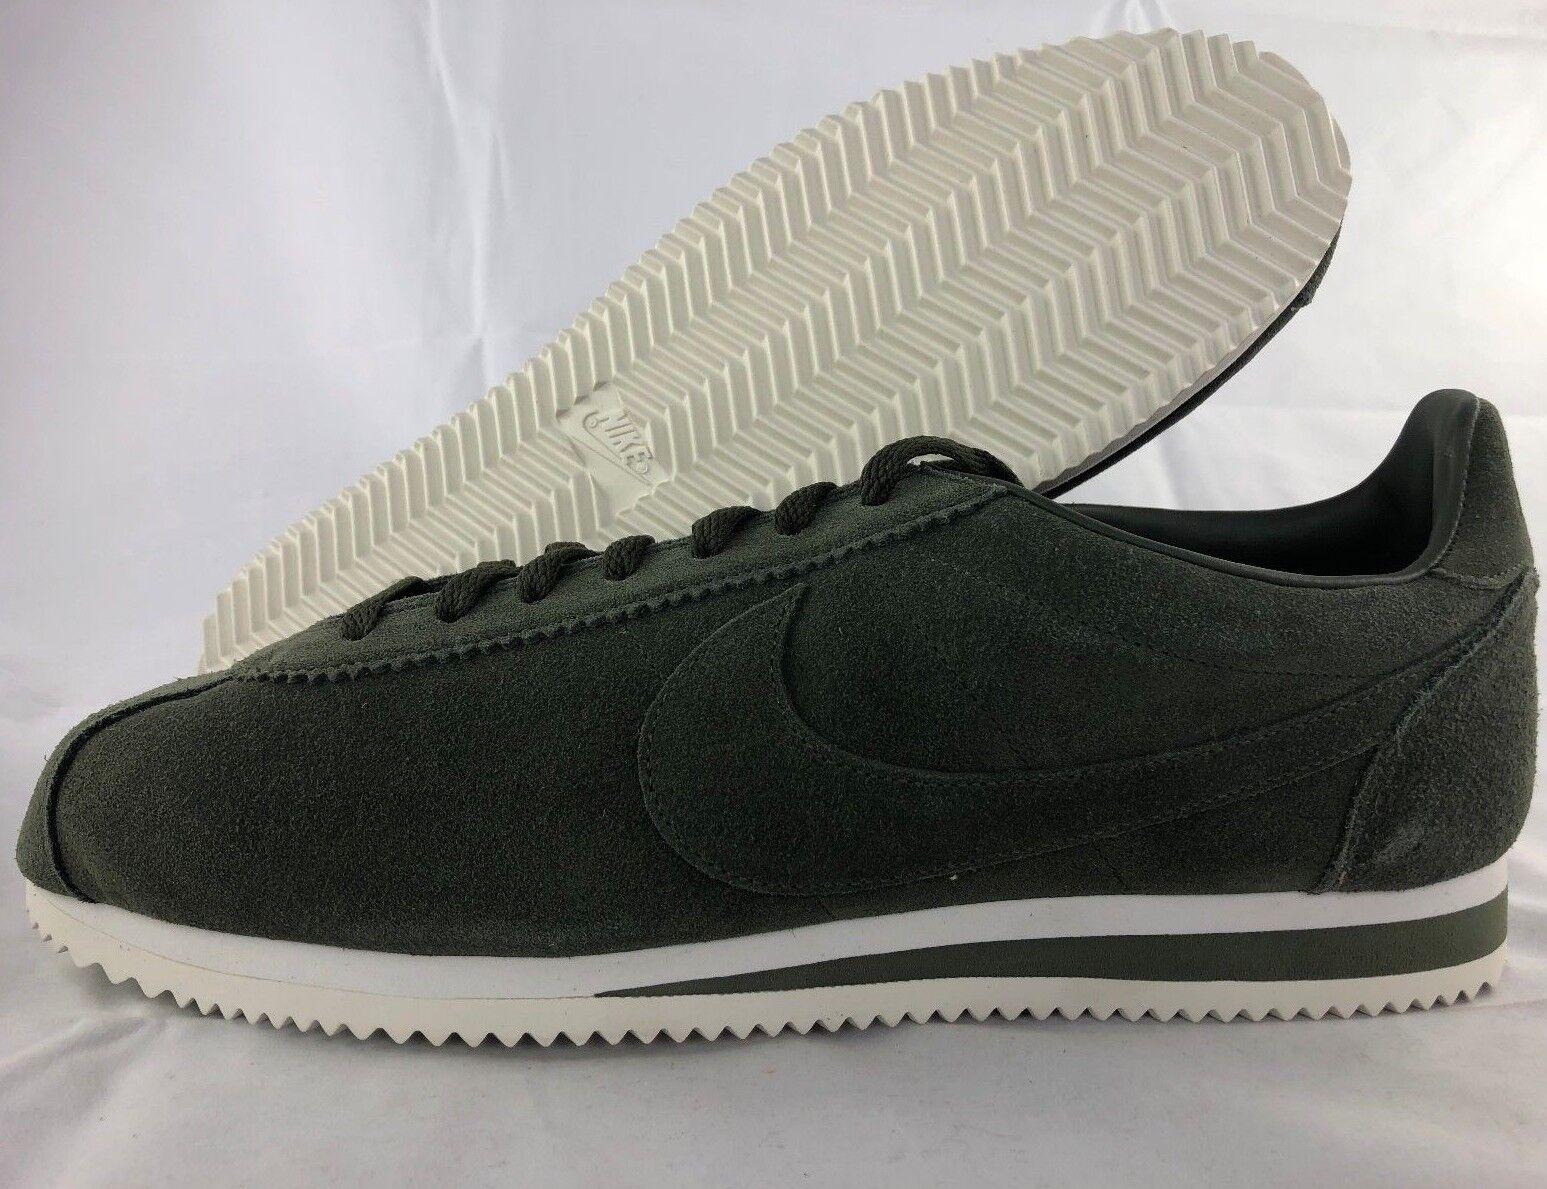 Nike Cortez Classic SE Cargo Khaki Green Olive Suede White 902801-300 Uomo 8-12